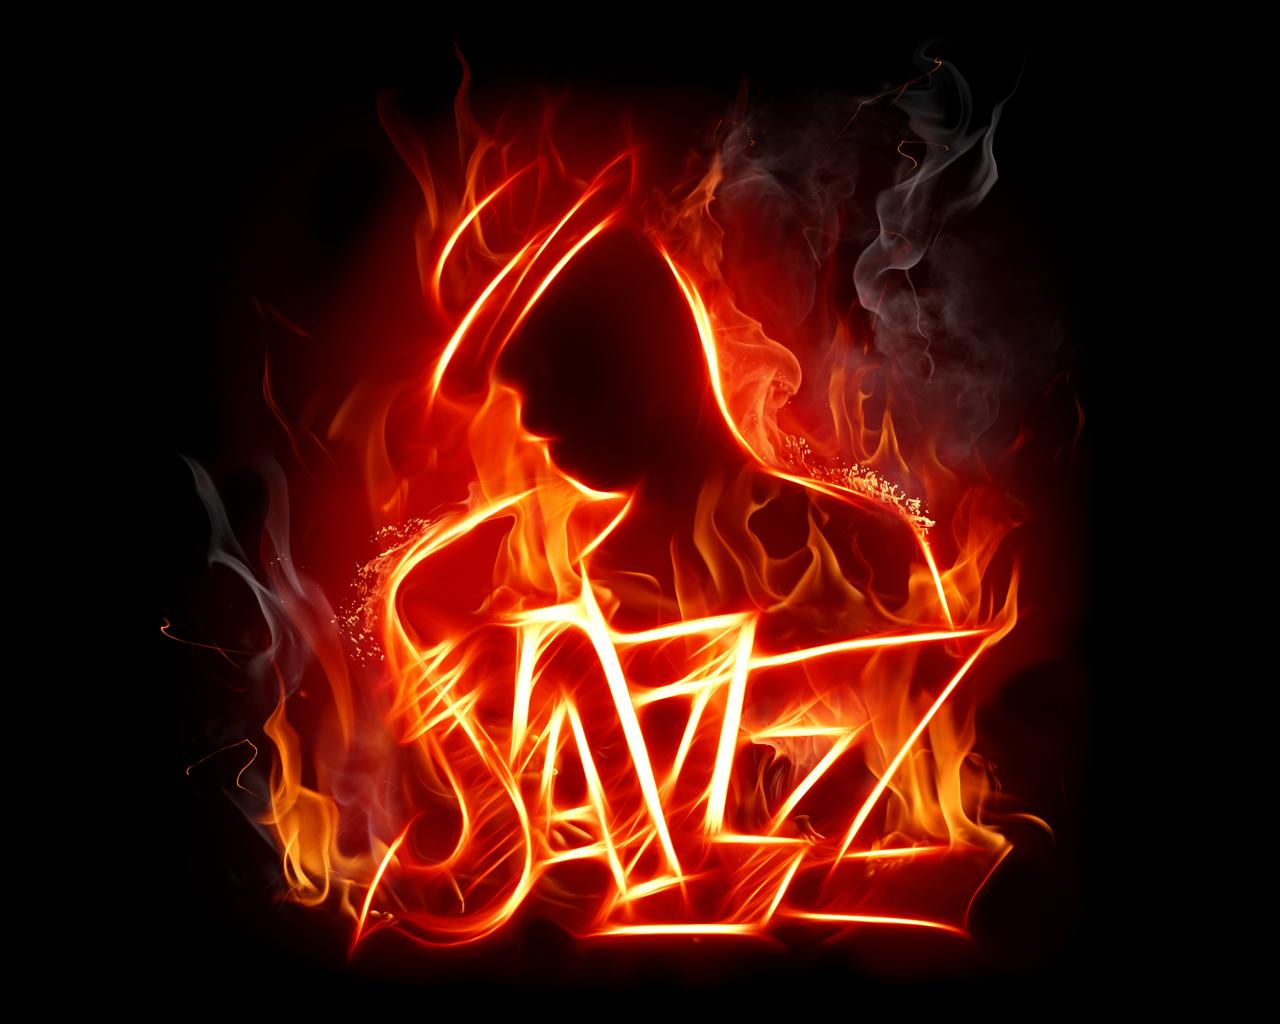 42 Jazz Hd Wallpaper On Wallpapersafari